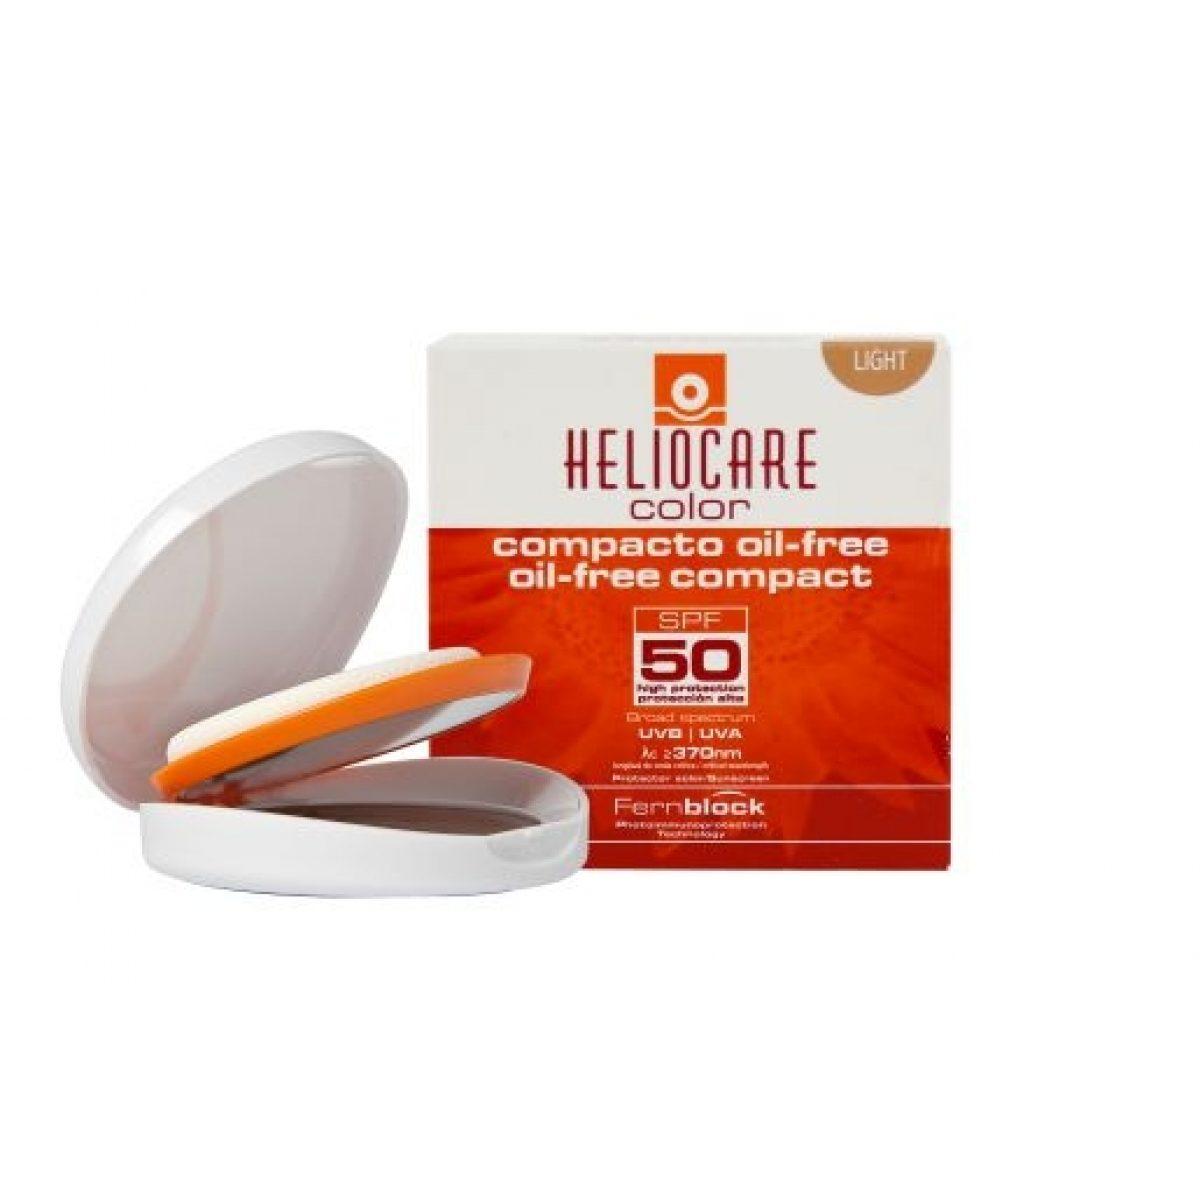 HELIOCARE COLOR COMPACT OIL-FREE LIGHT SPF50